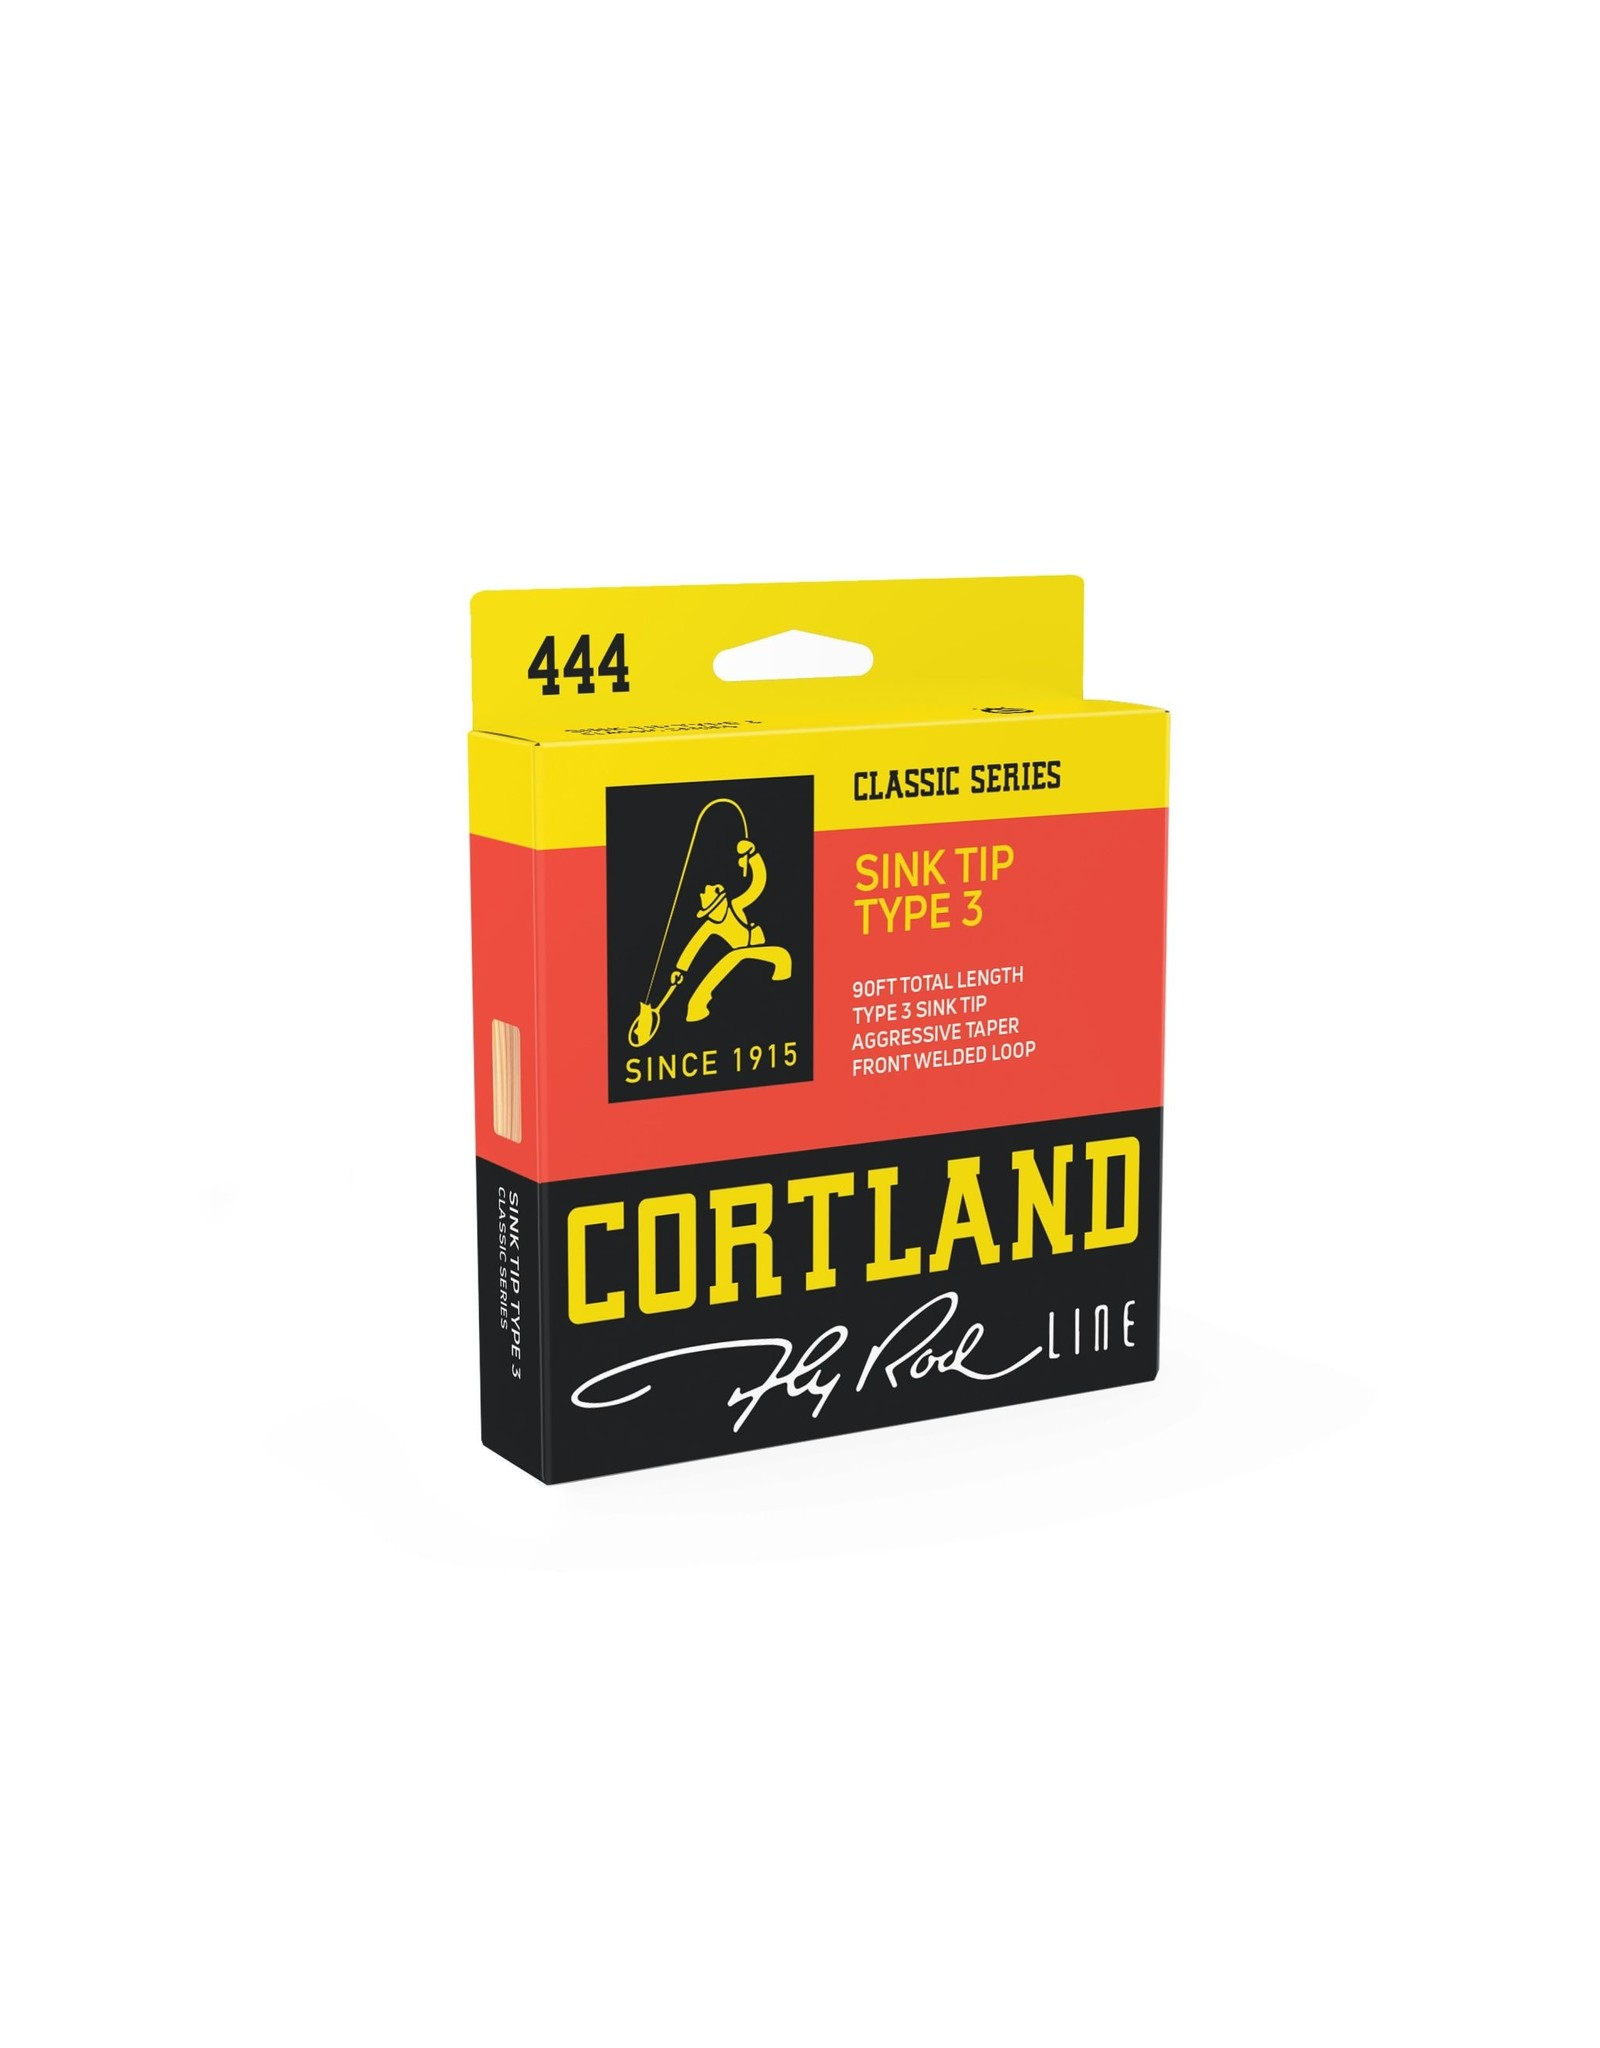 Cortland Line Cortland 444 Classic Sink-Tip Type 3 Fly Line